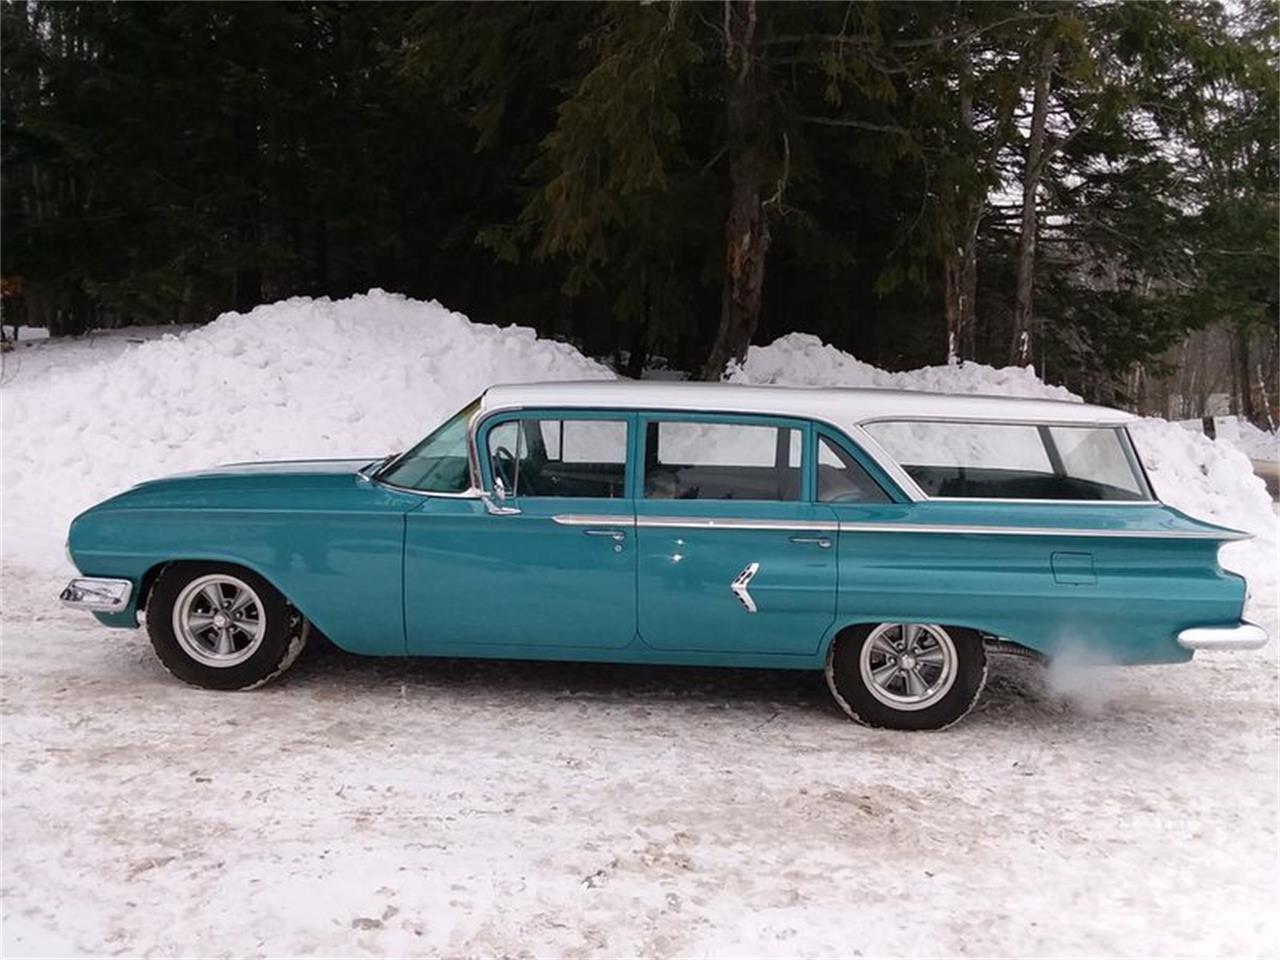 1960 Chevrolet Station Wagon For Sale Classiccars Com Cc 1058421